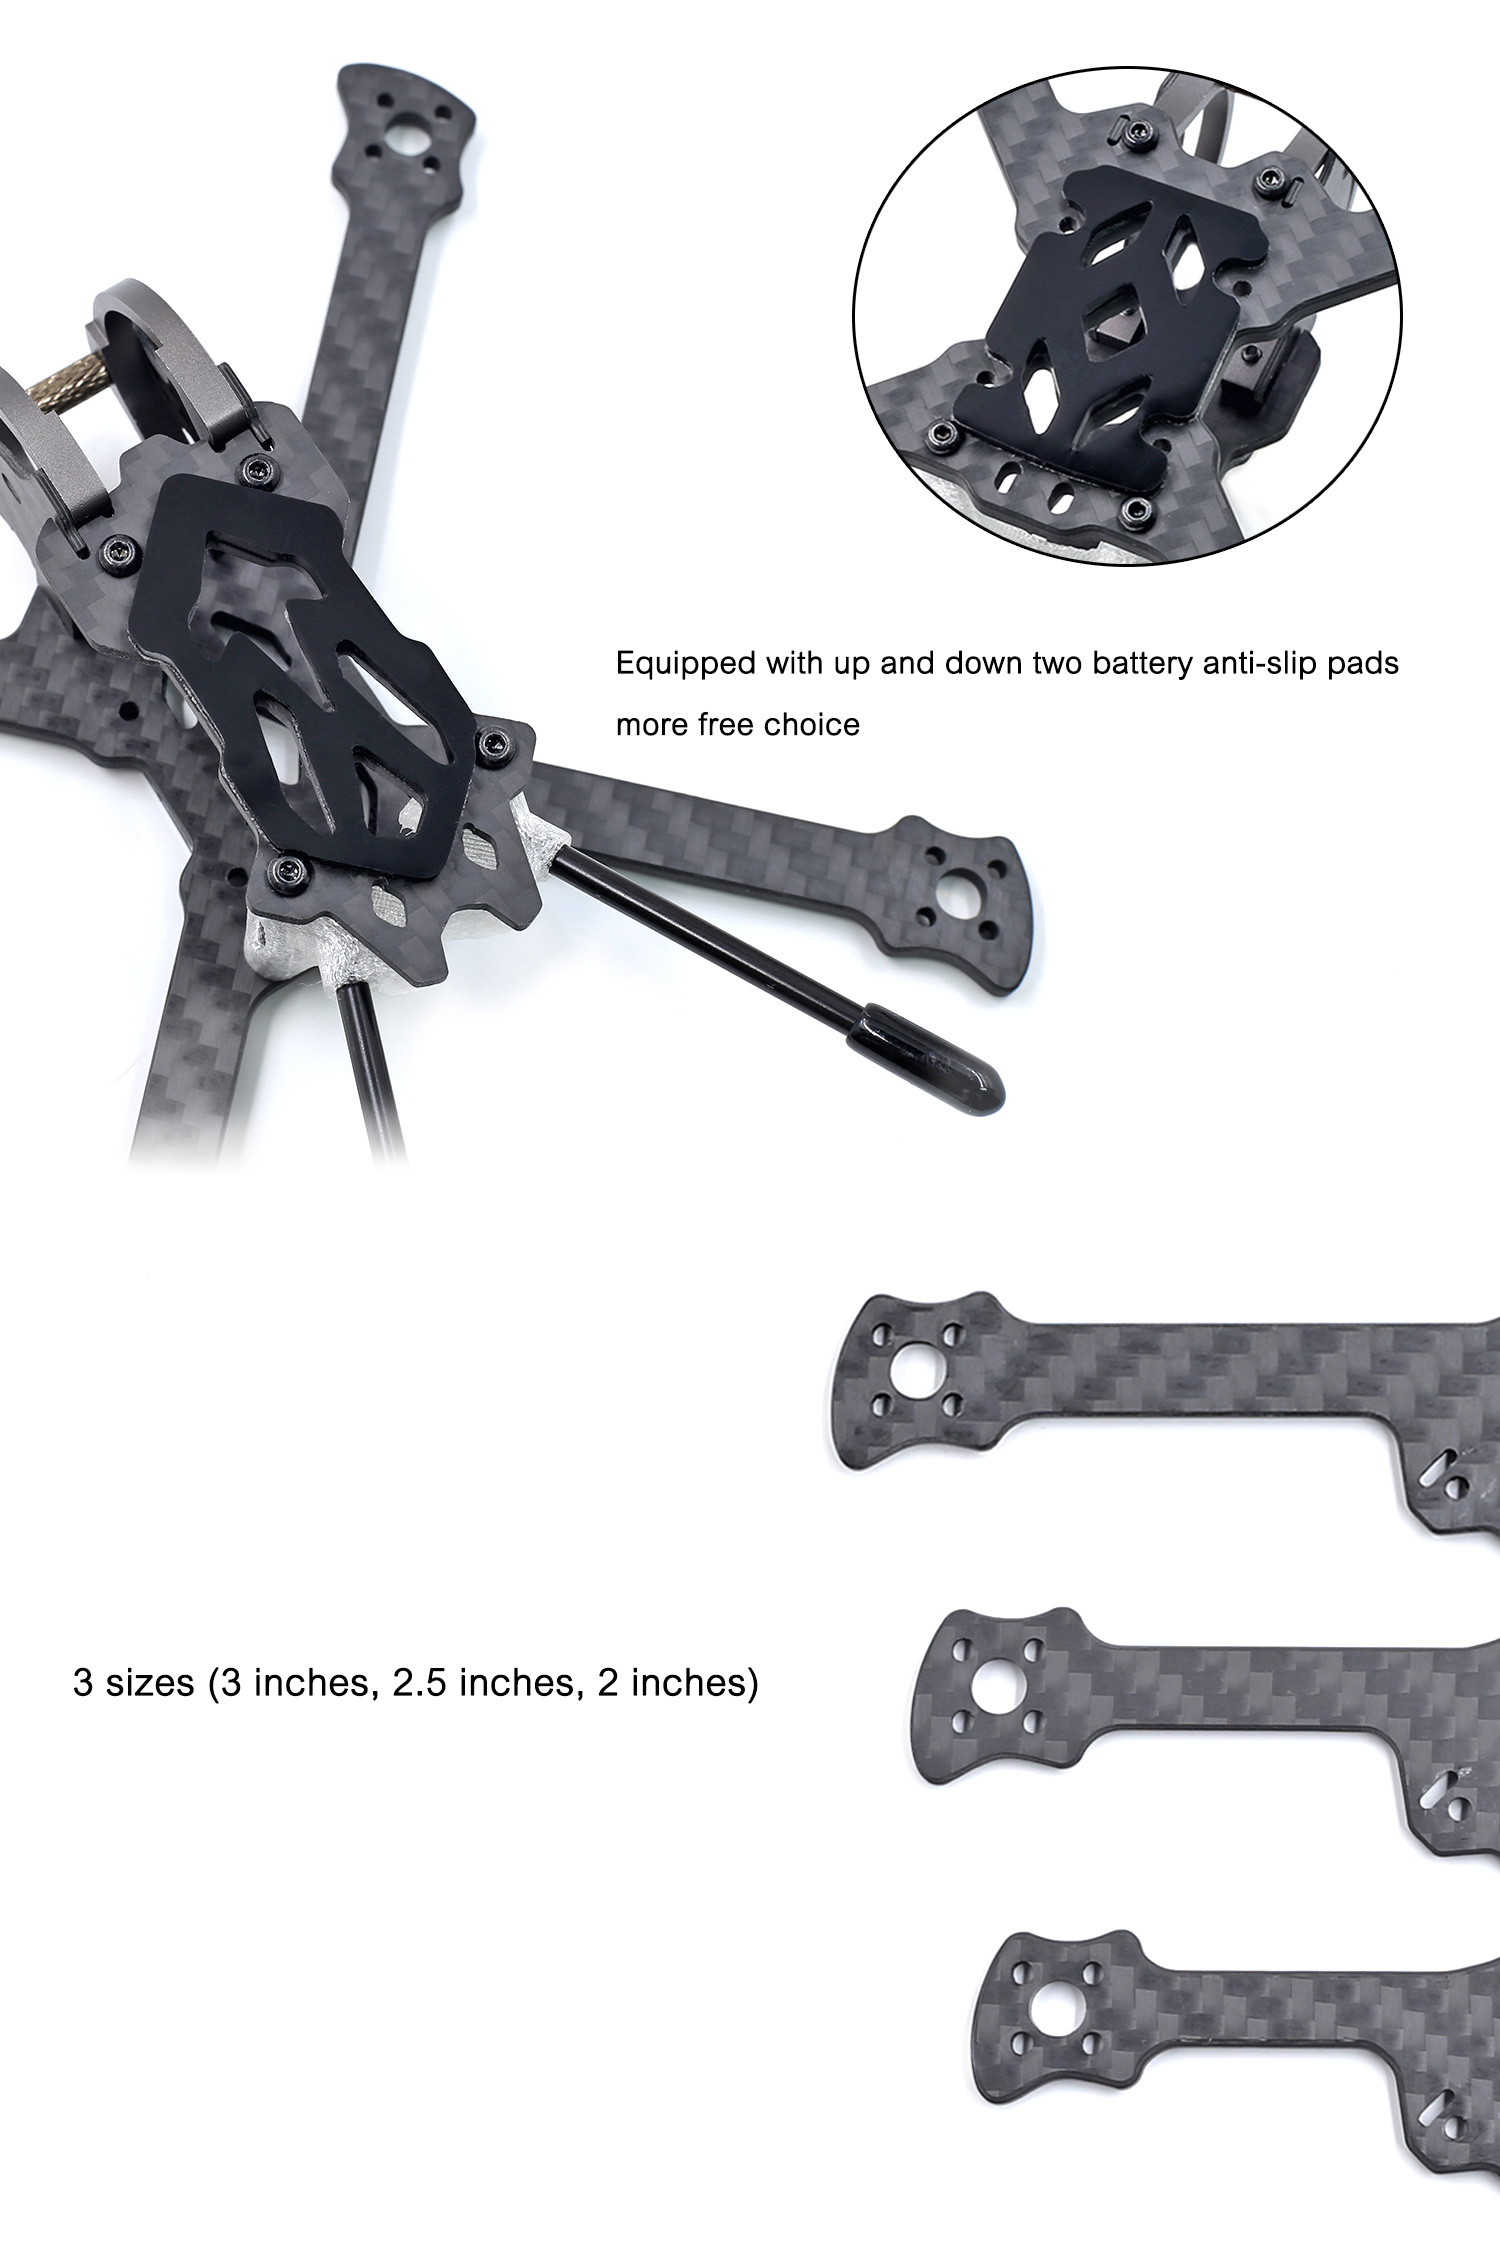 Geprc Gep Px2 5 2 5 Inch 125mm Wheelbase 3mm Arm 3k Carbon